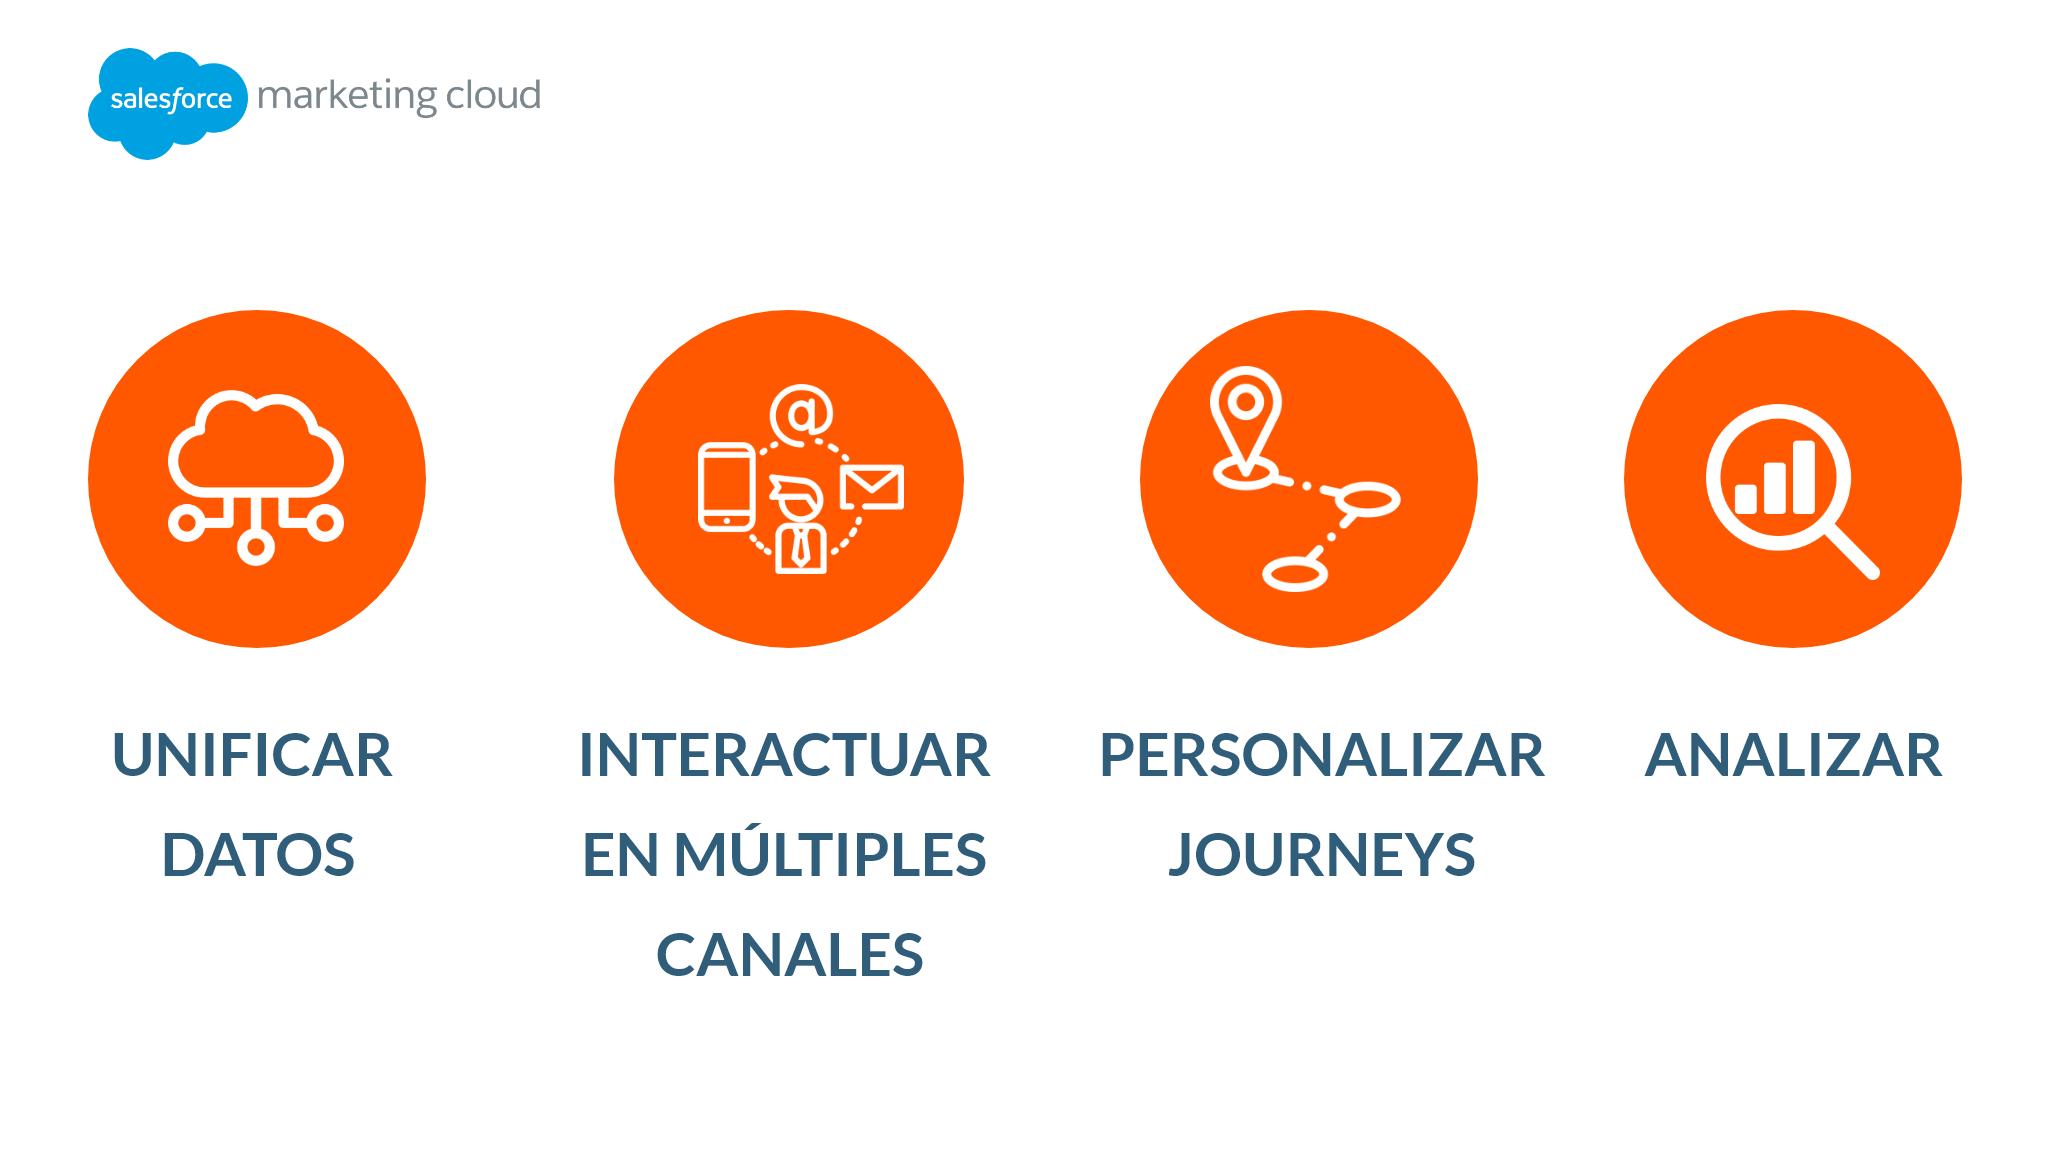 Pilares fundamentales de Marketing Cloud